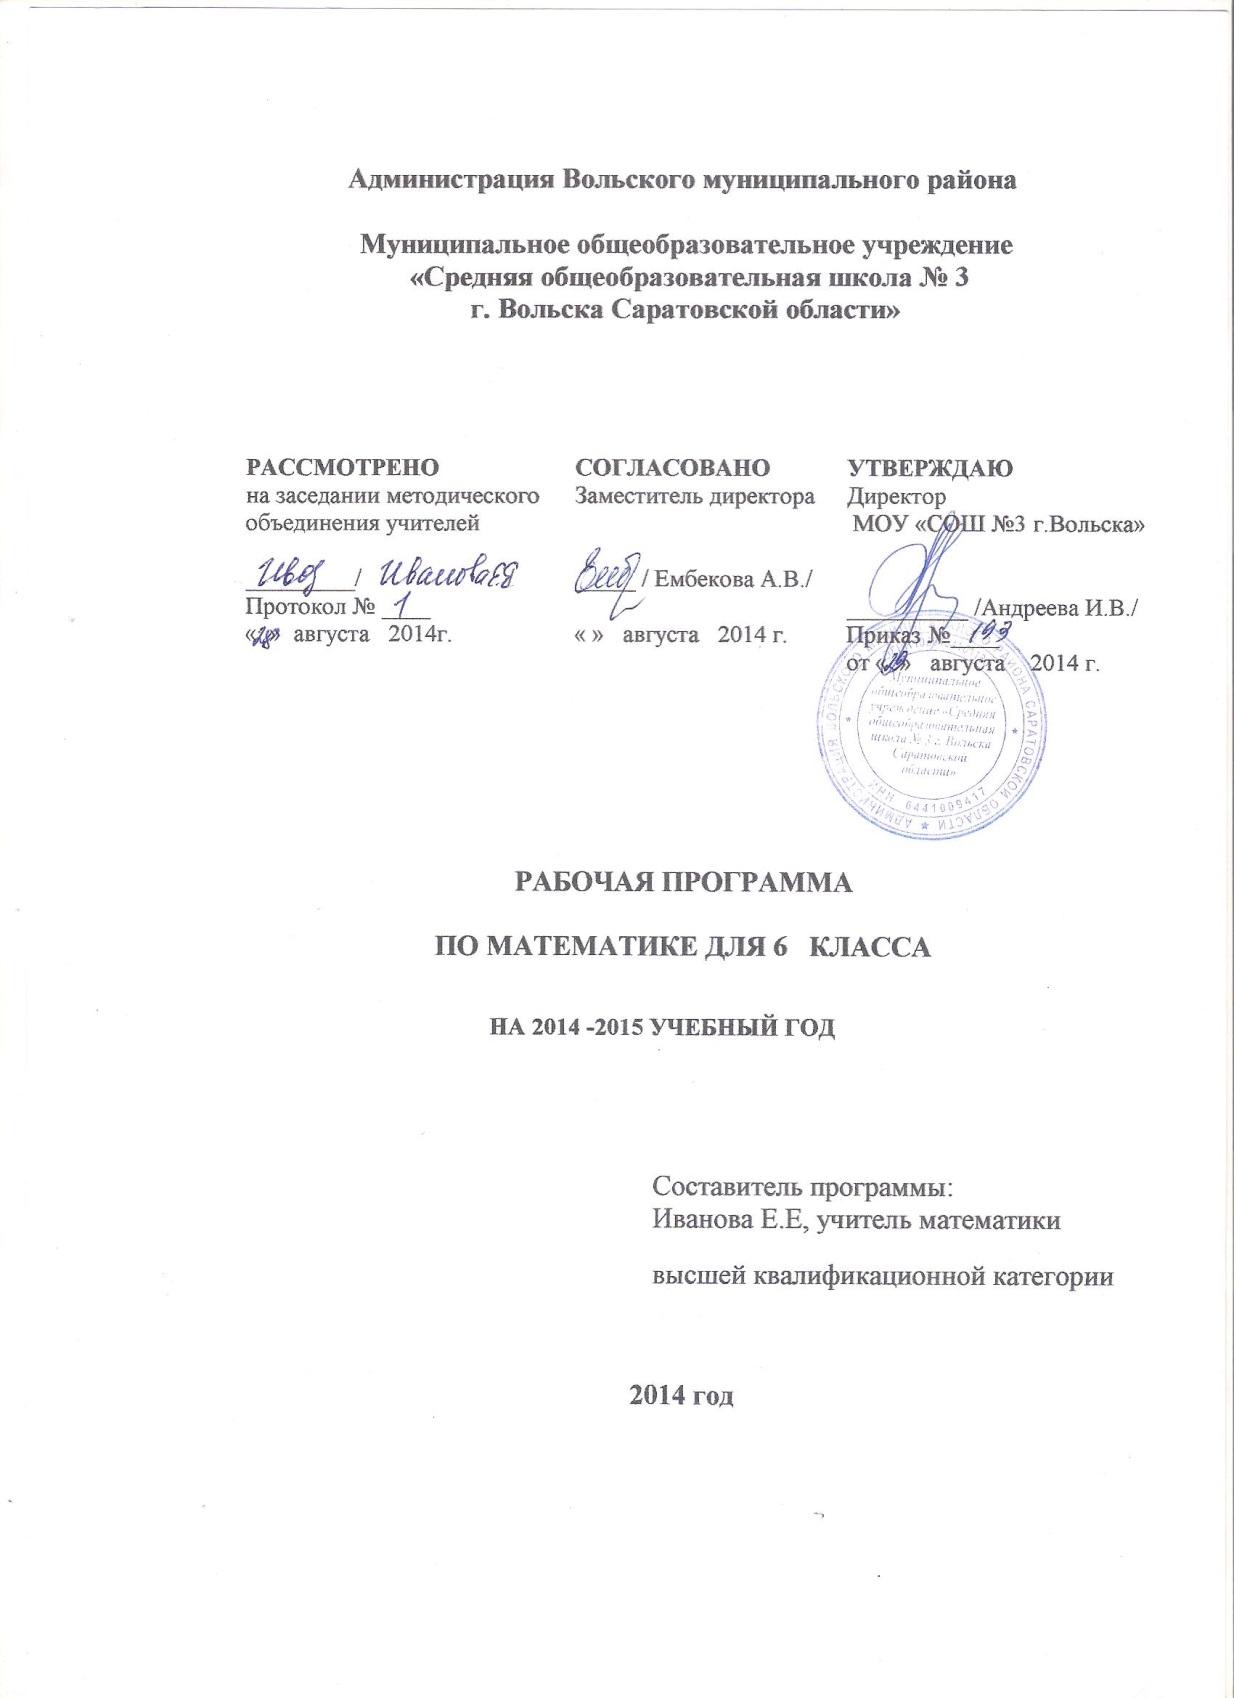 C:\Users\Елена\Documents\рабочие программы 2014-2015\титулы 2014\2014-09-05 6 класс 14\6 класс 14 001.jpg